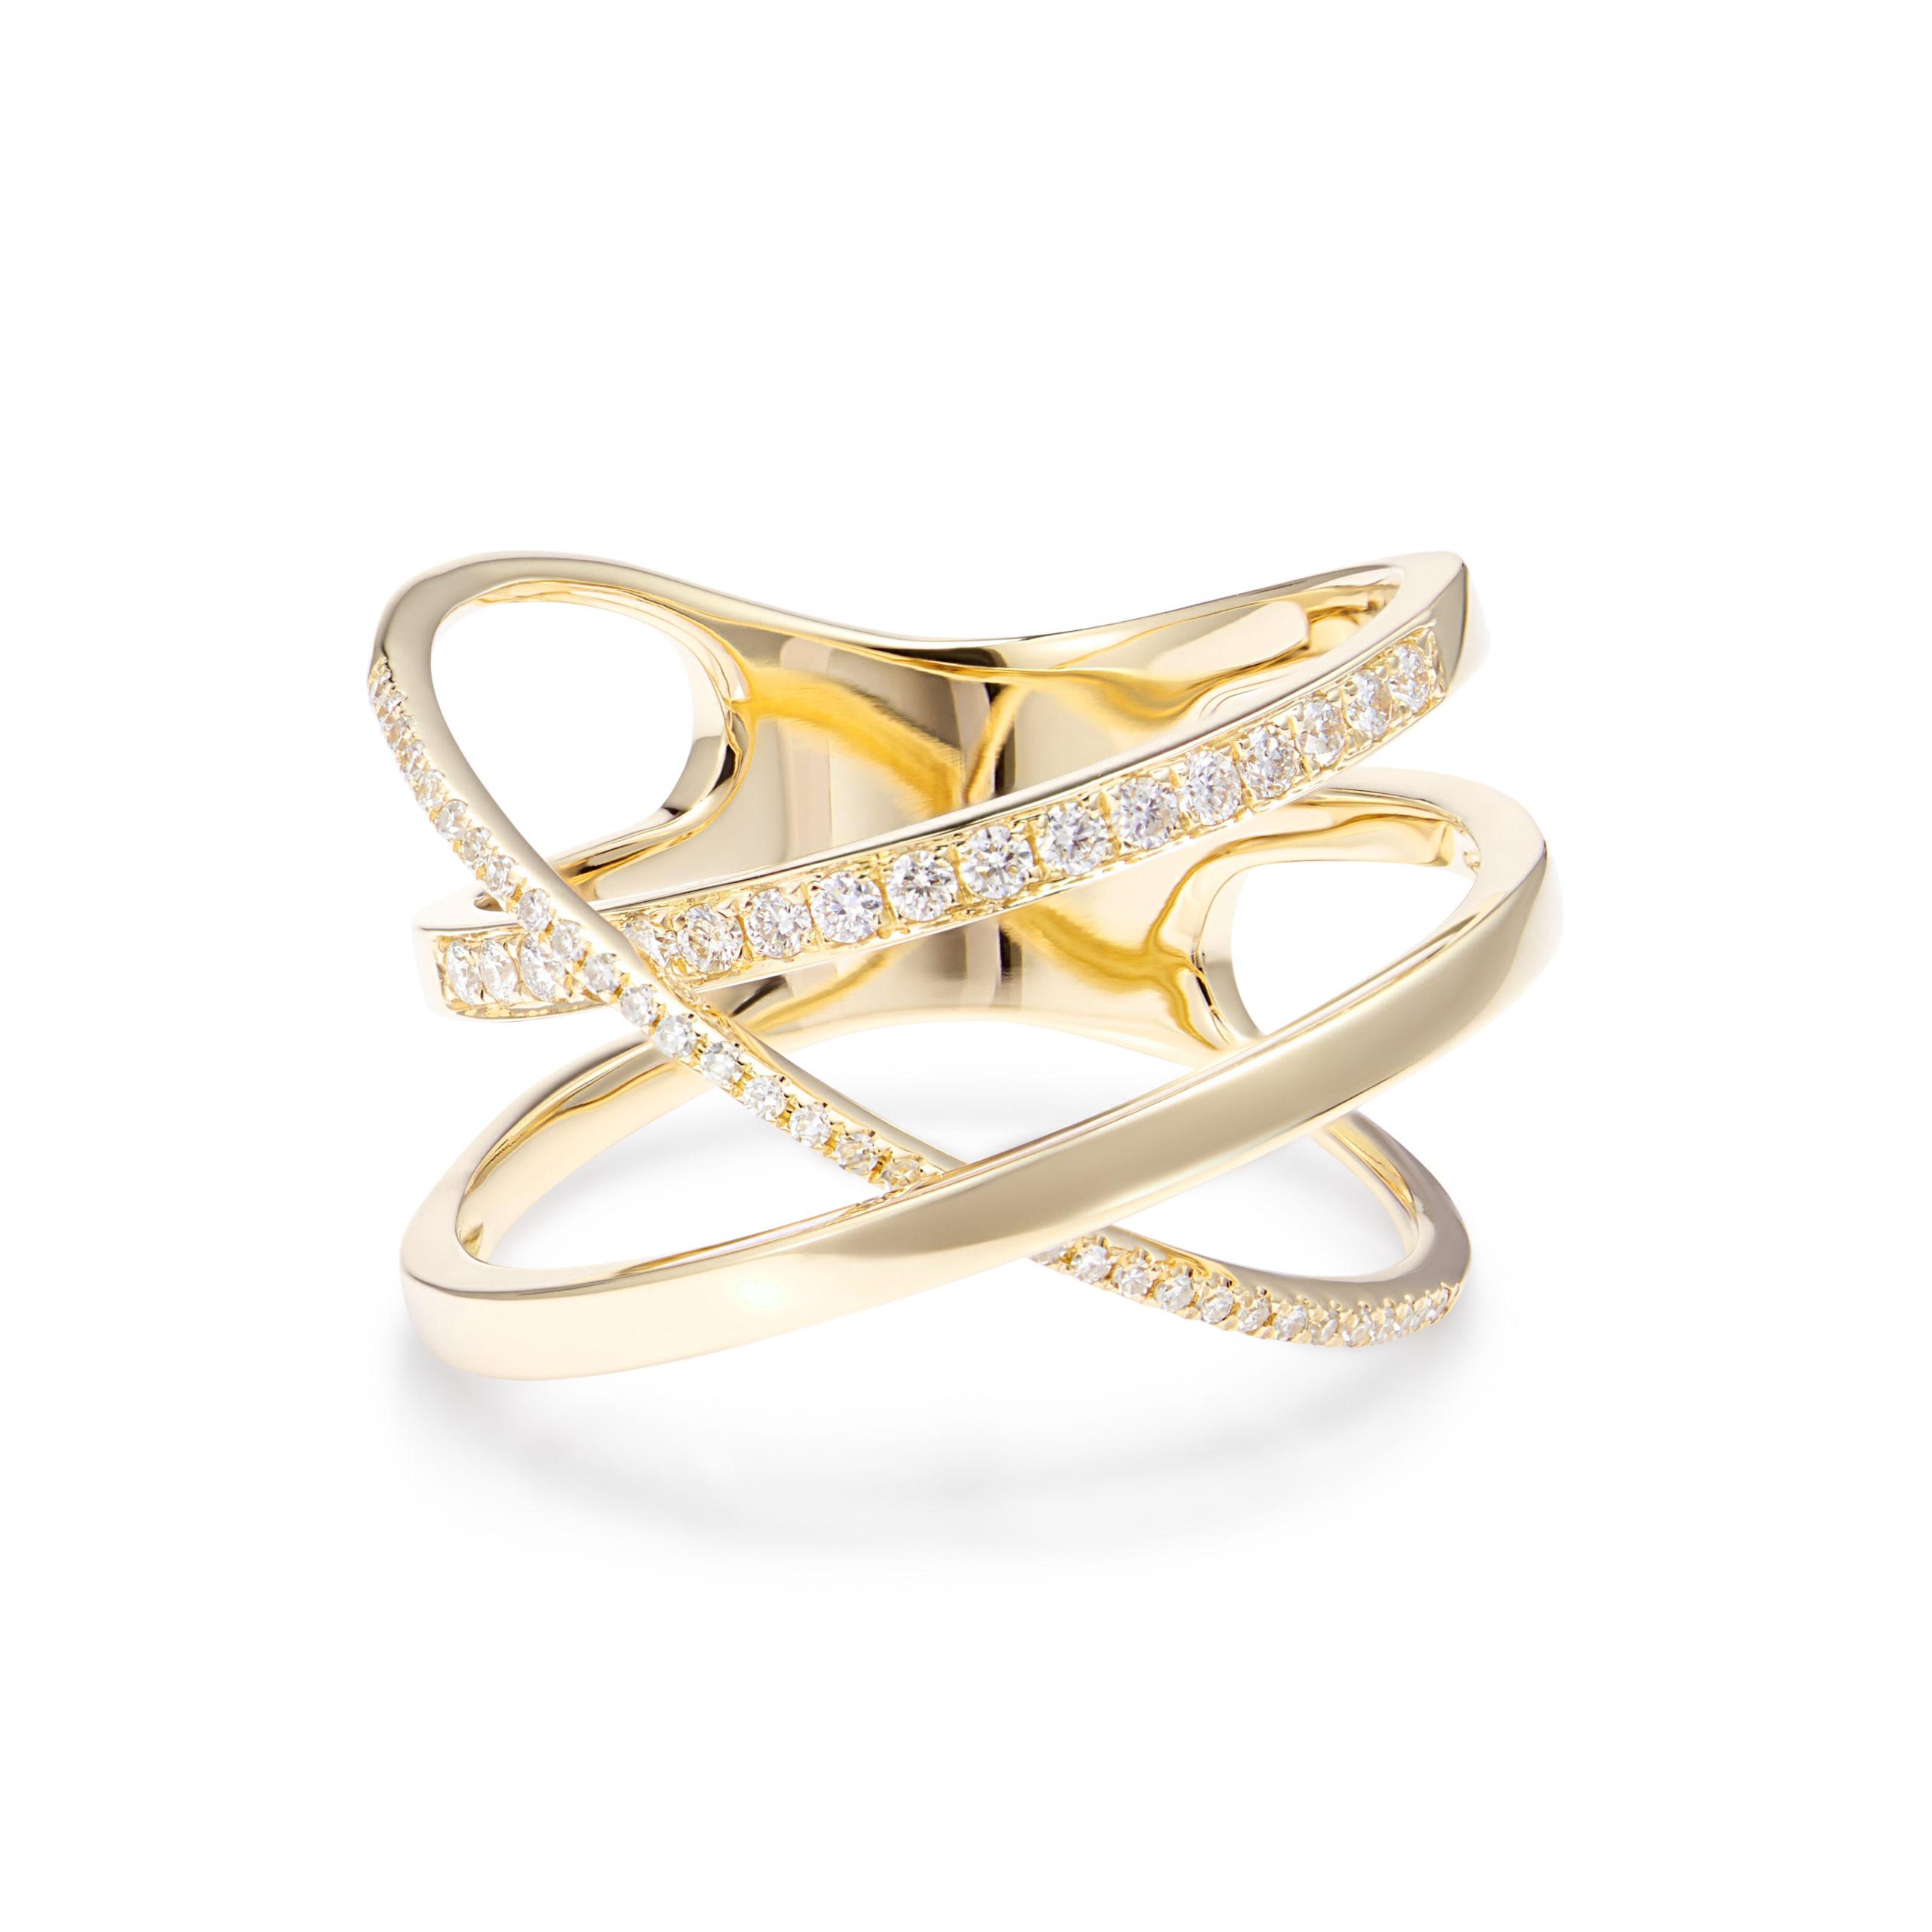 georgina-boyce-fine-jewellery-orbit-ring-alternative-engagement-ring